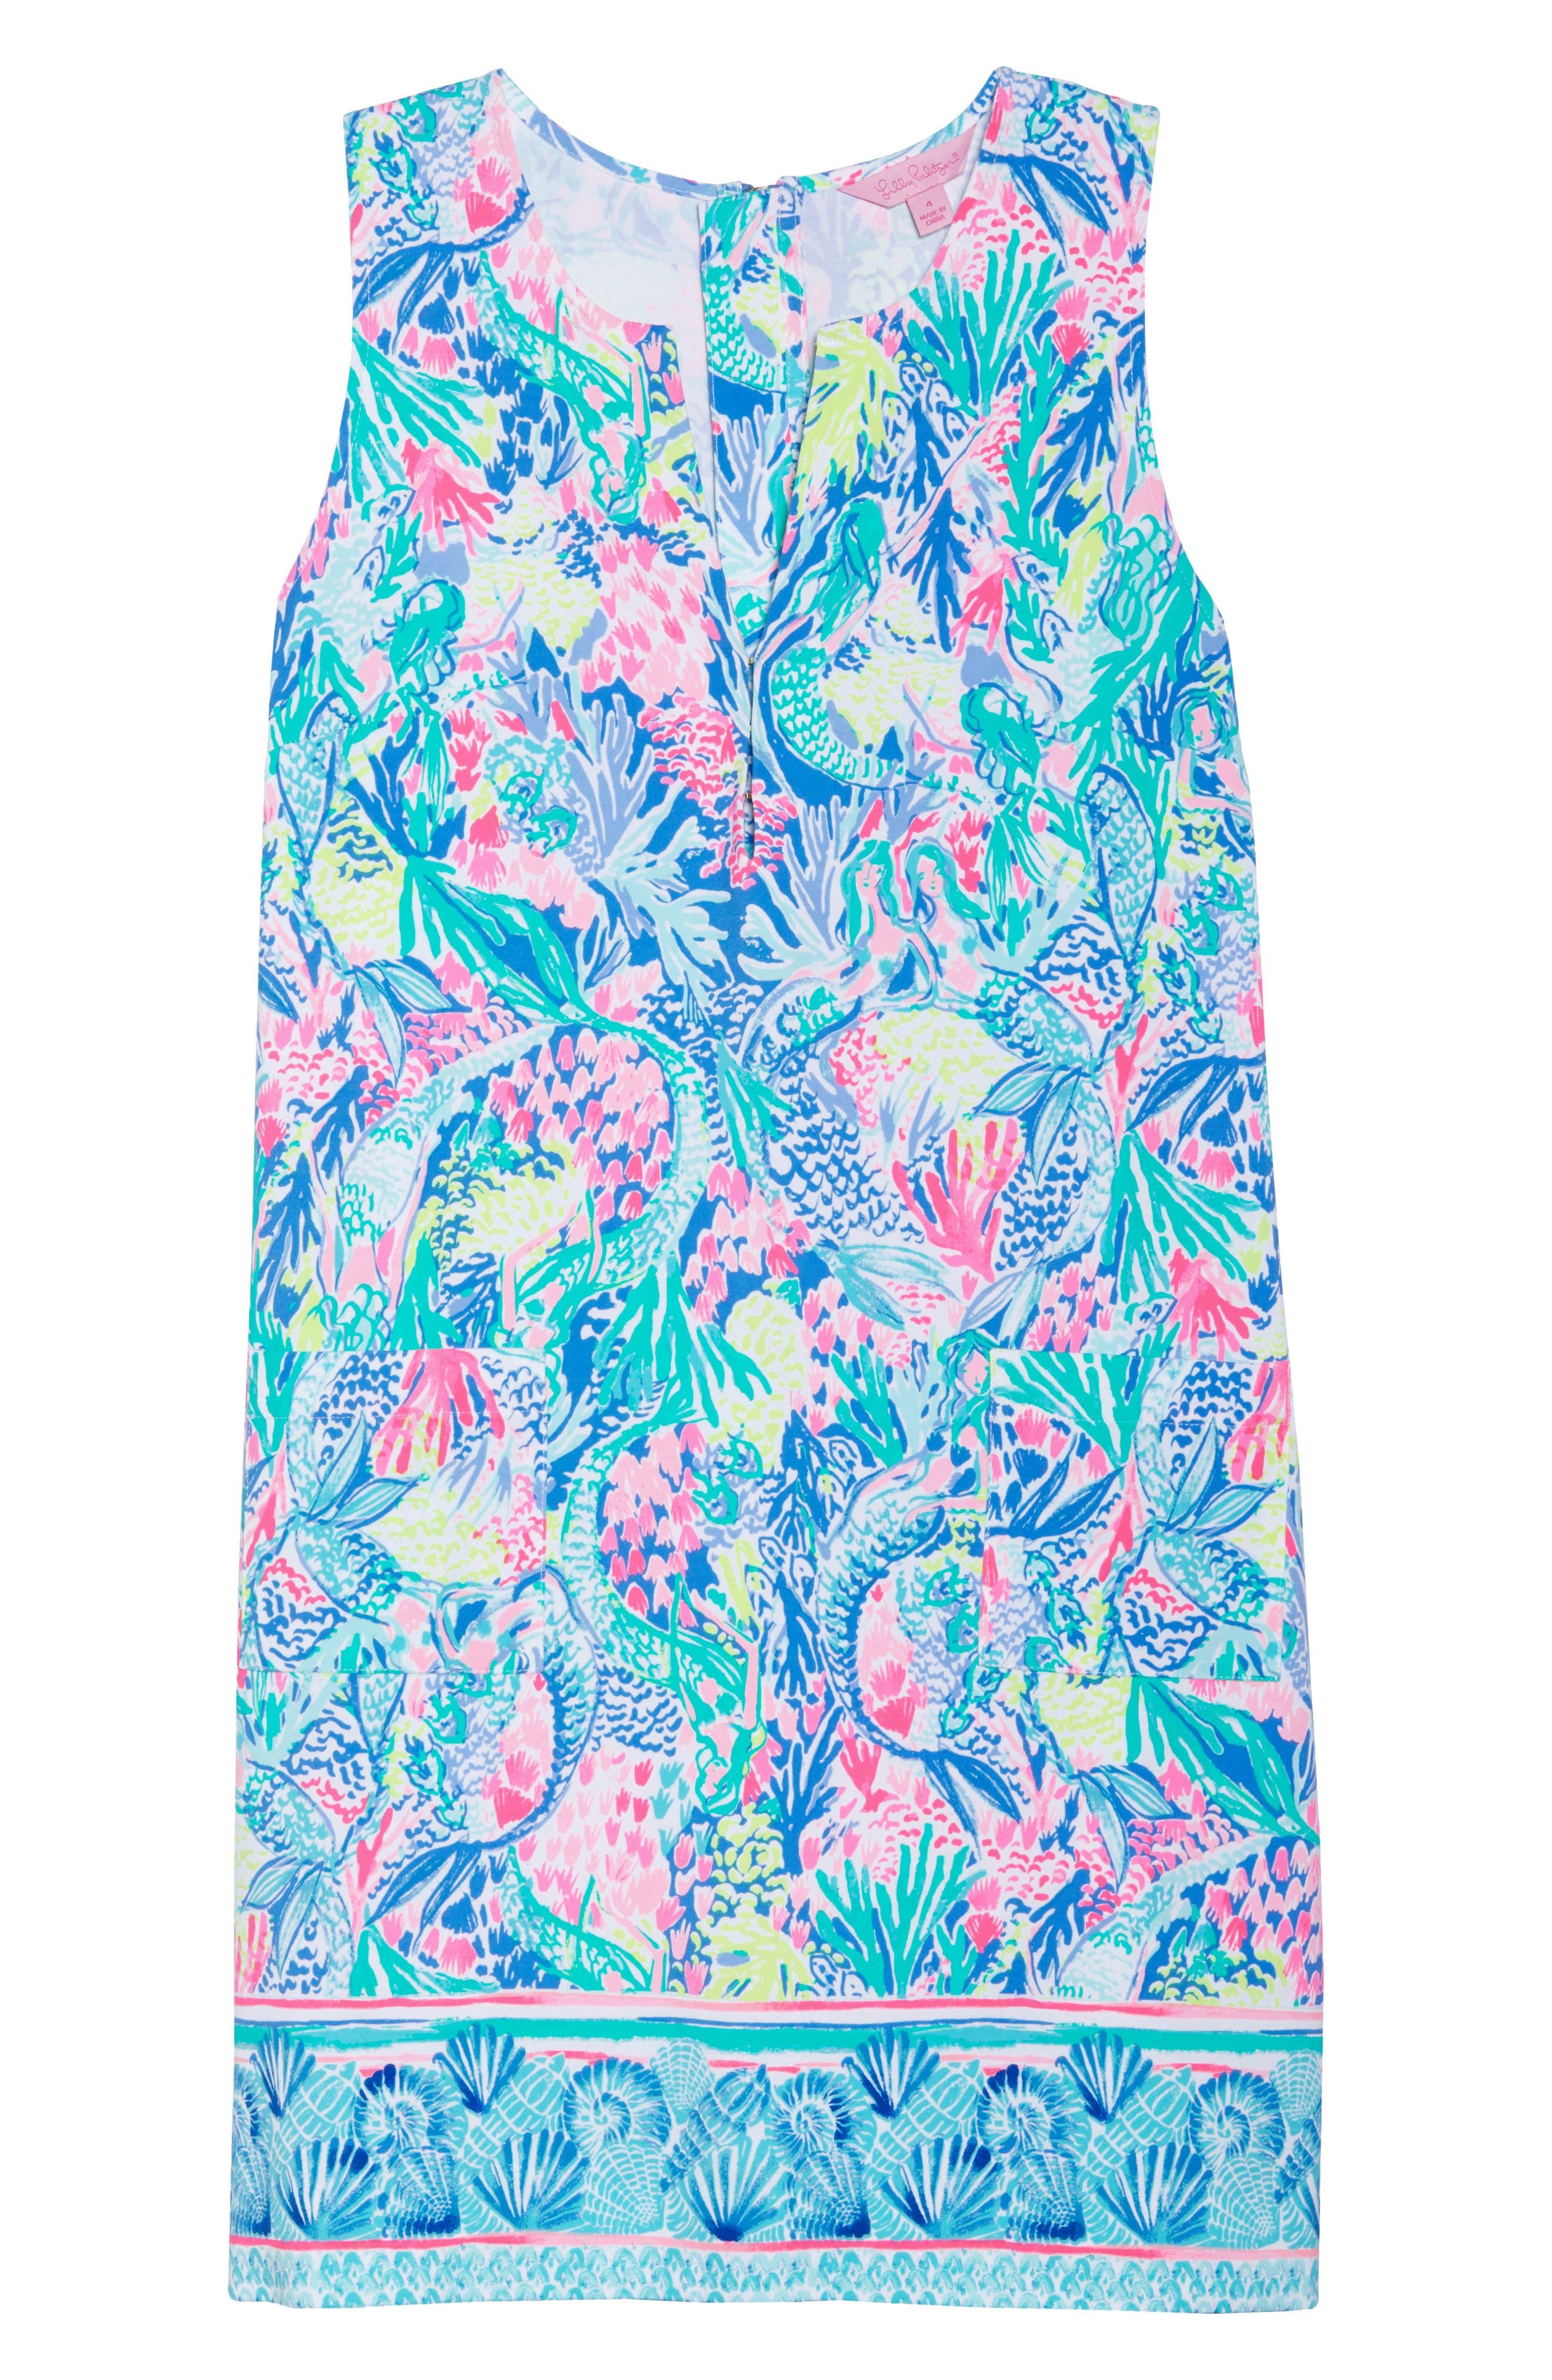 Kelby Stretch Shift Dress,                             Alternate thumbnail 7, color,                             MULTI MERMAIDS COVE